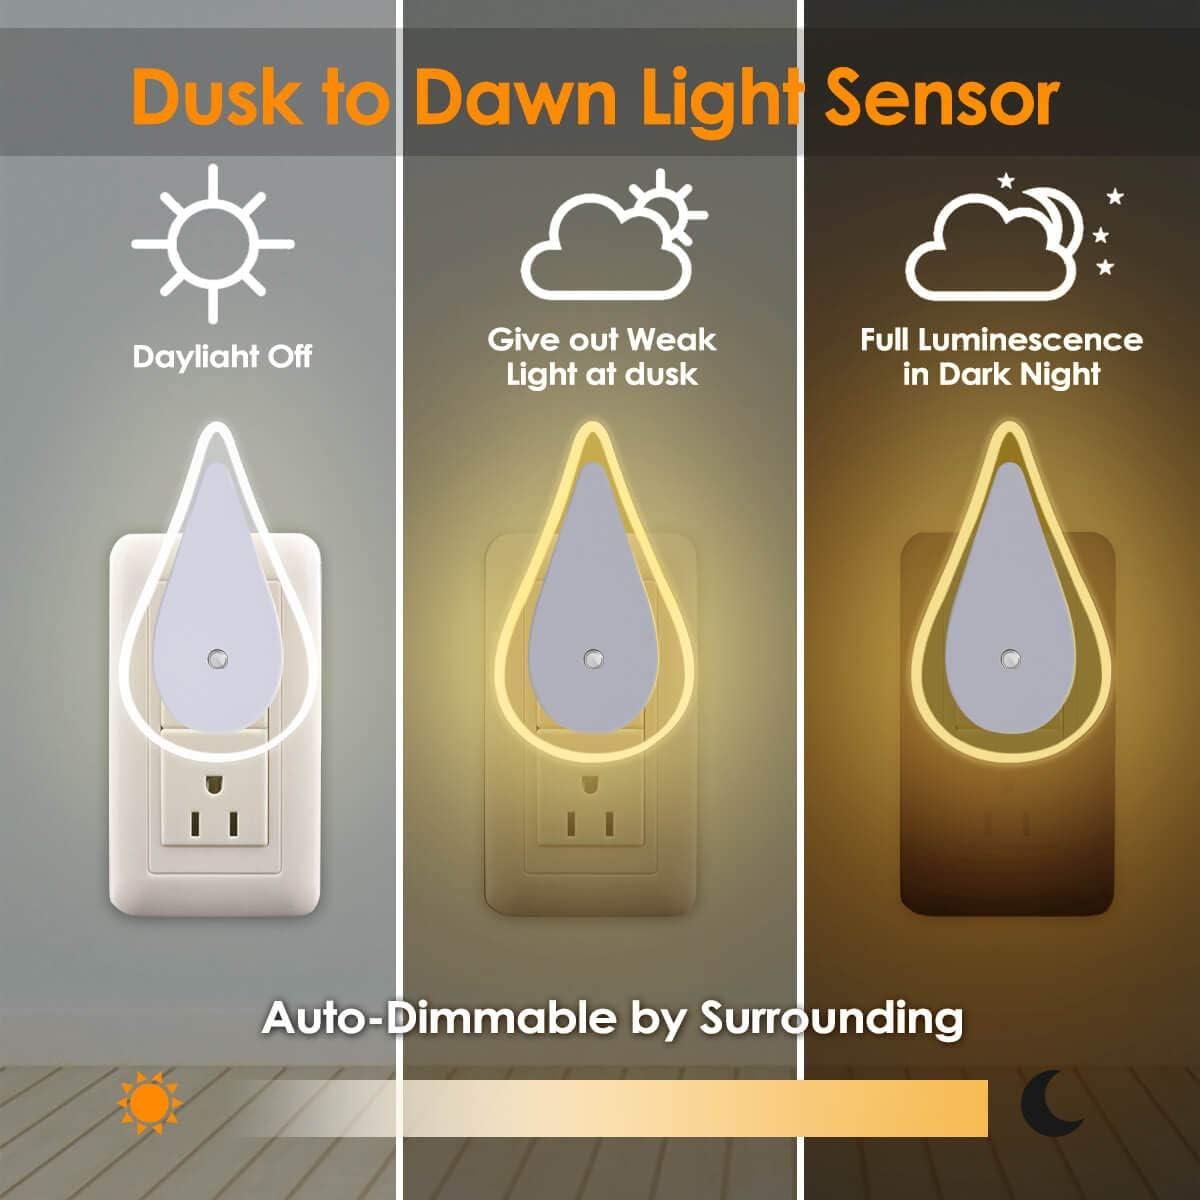 Free Amazon Promo Code 2020 for LED Plug in Night Light